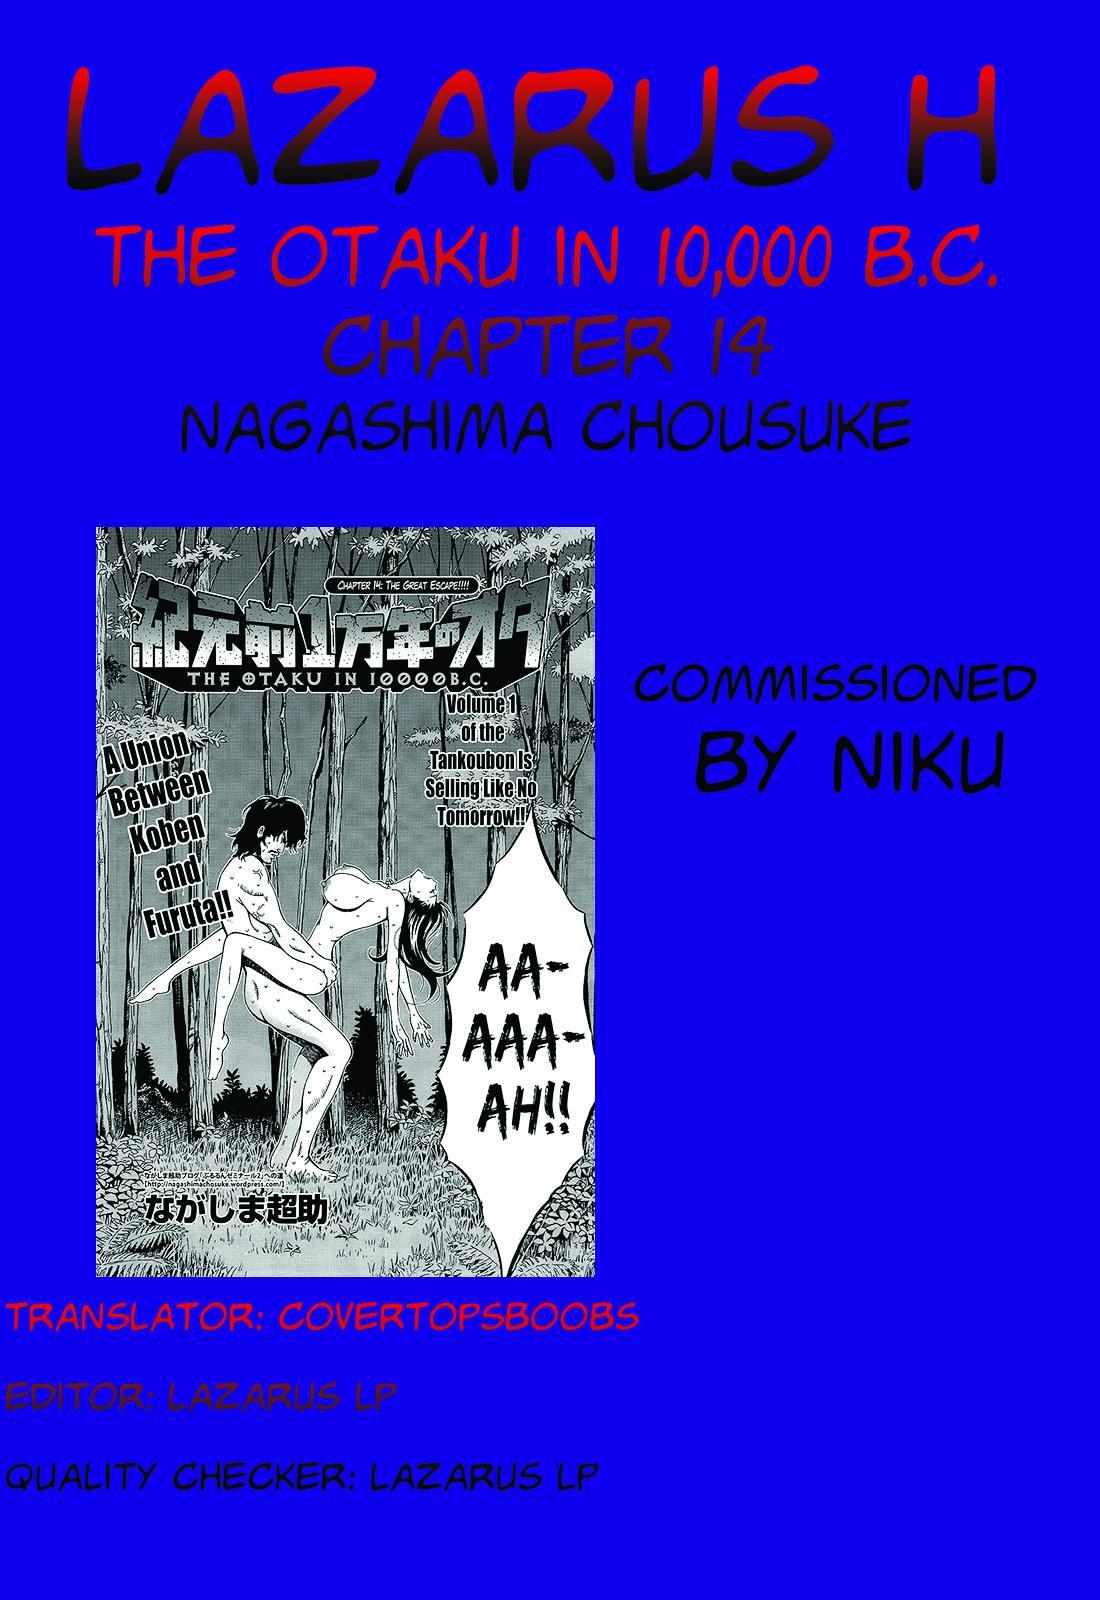 Kigenzen 10000 Nen no Ota   The Otaku in 10,000 B.C. Ch. 1-22 270